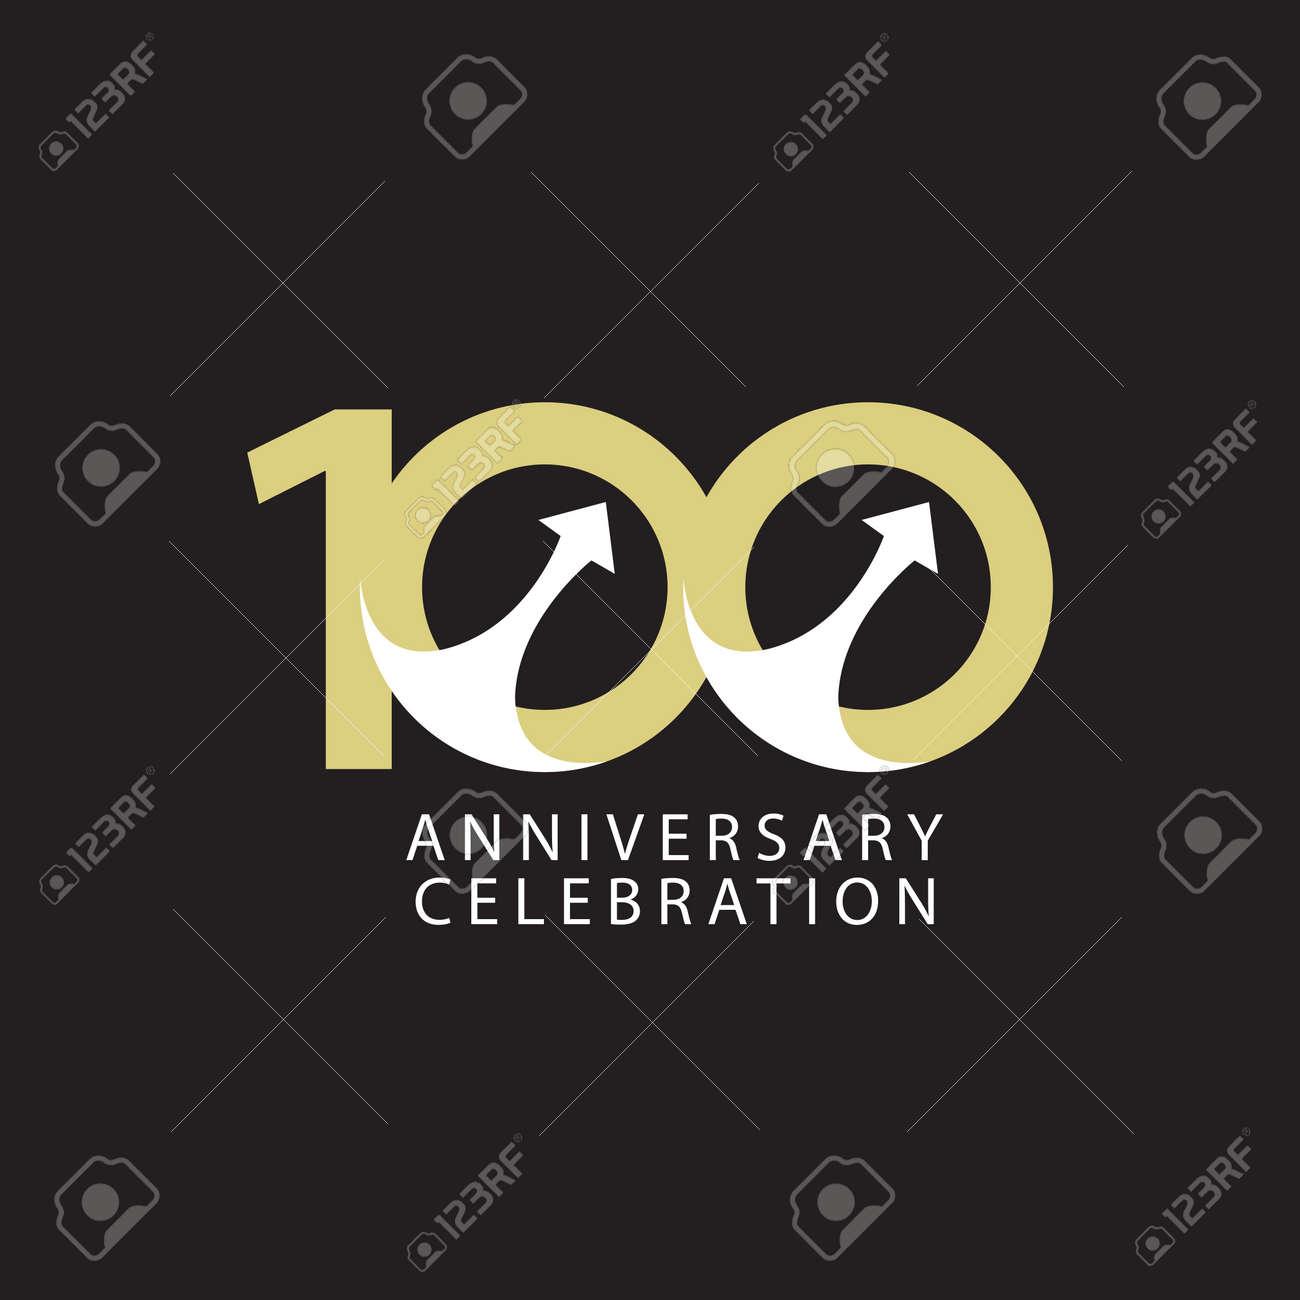 100 Years Anniversary Celebration Vector Template Design Illustration - 163698043